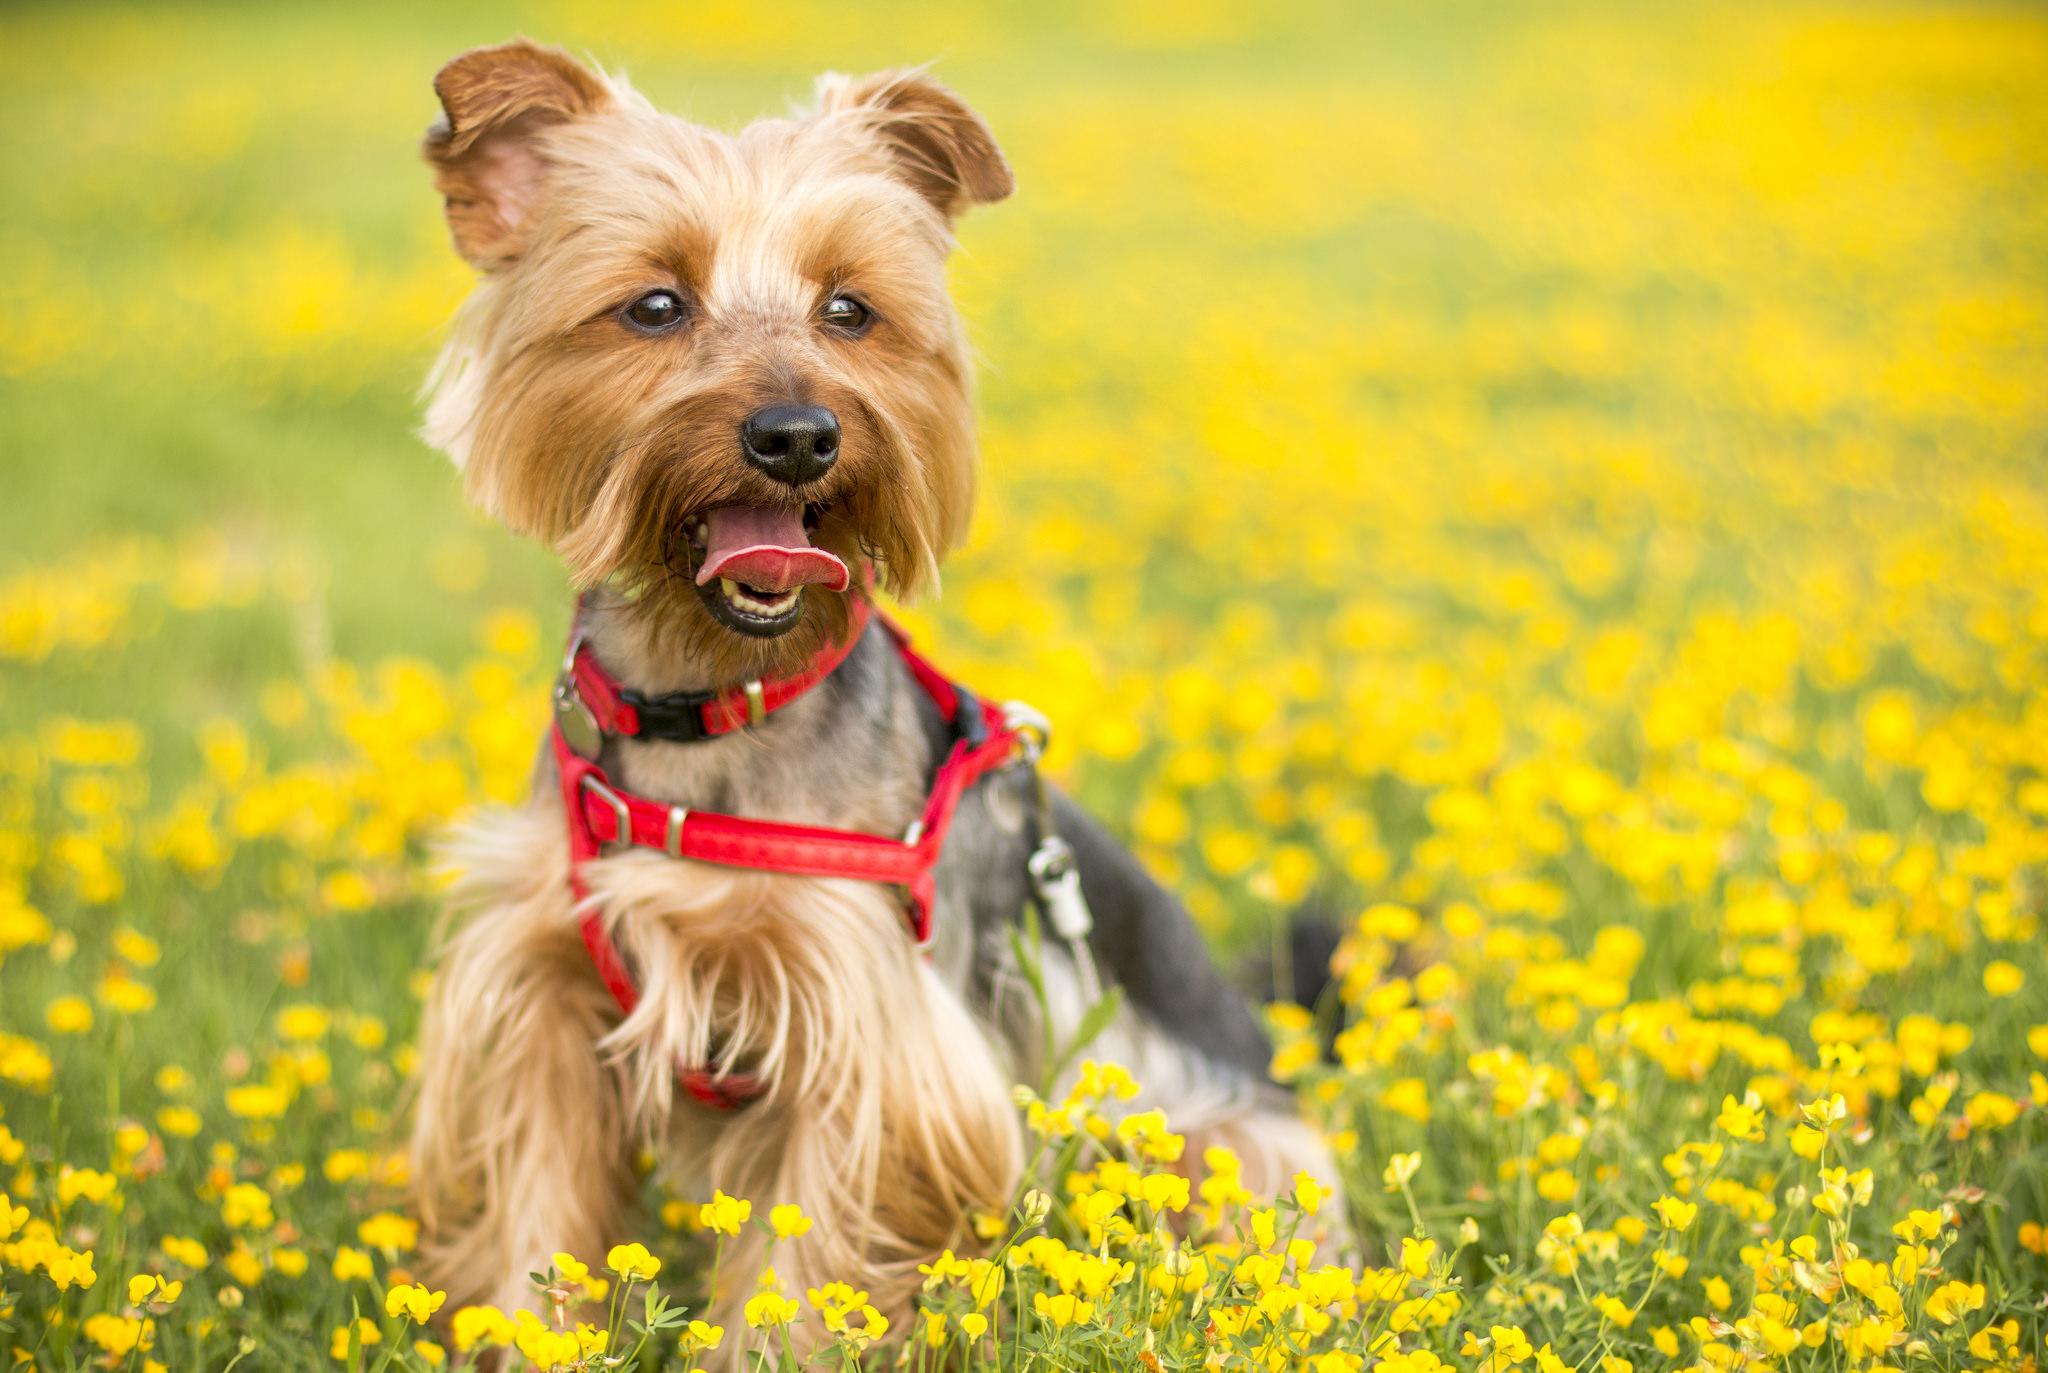 dog in flowers.jpeg